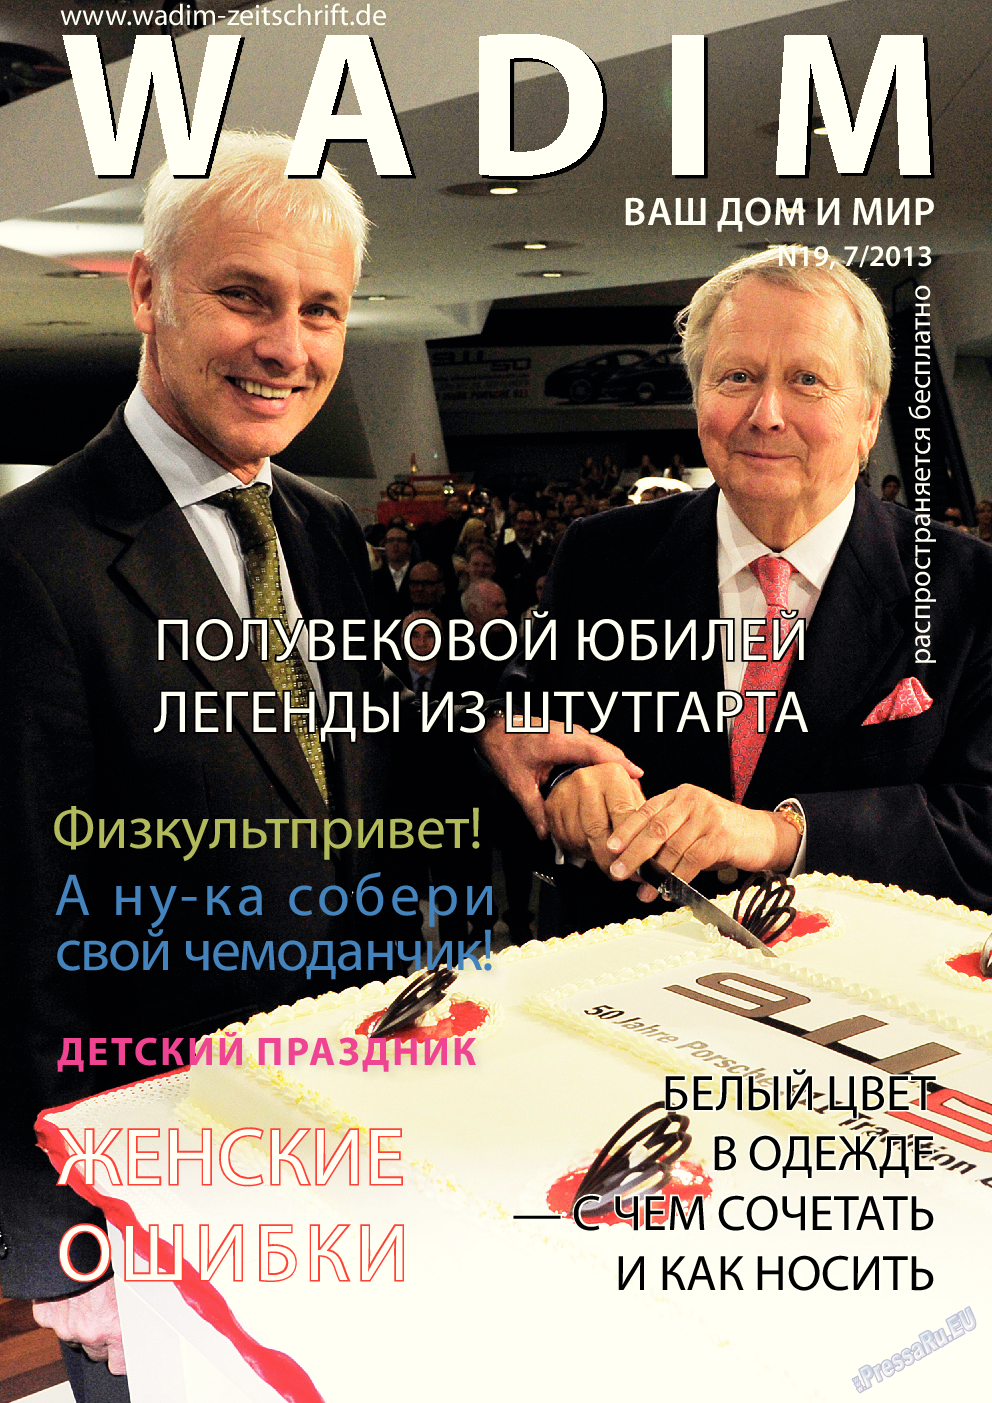 Wadim (журнал). 2013 год, номер 7, стр. 1